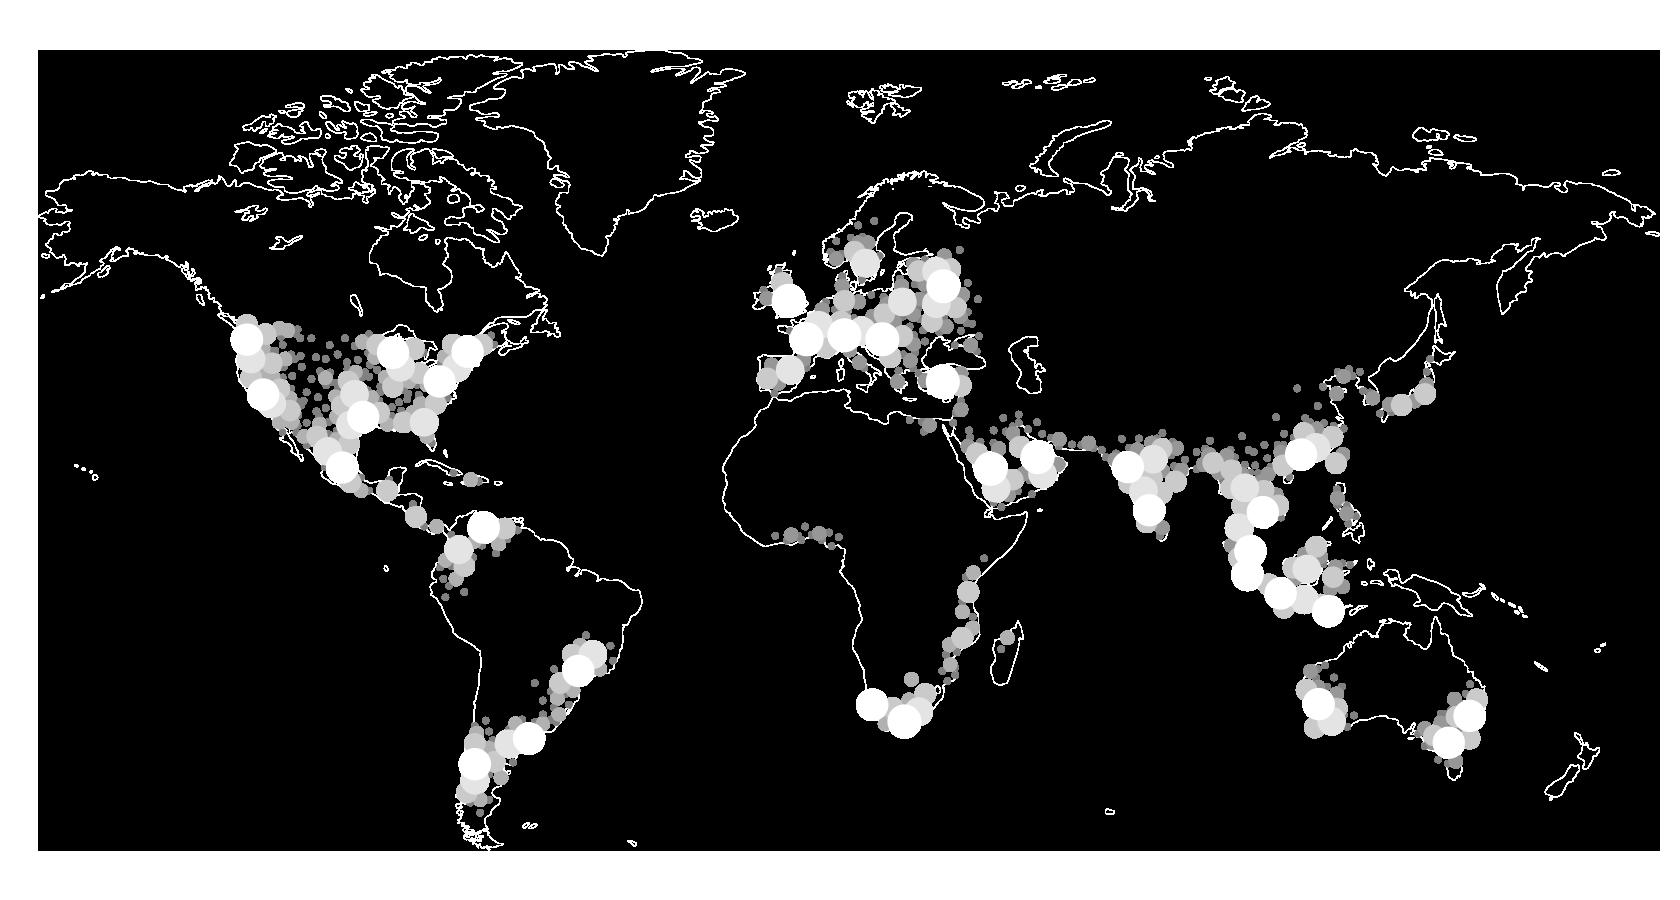 world-map-widewalls-audience-1680x900